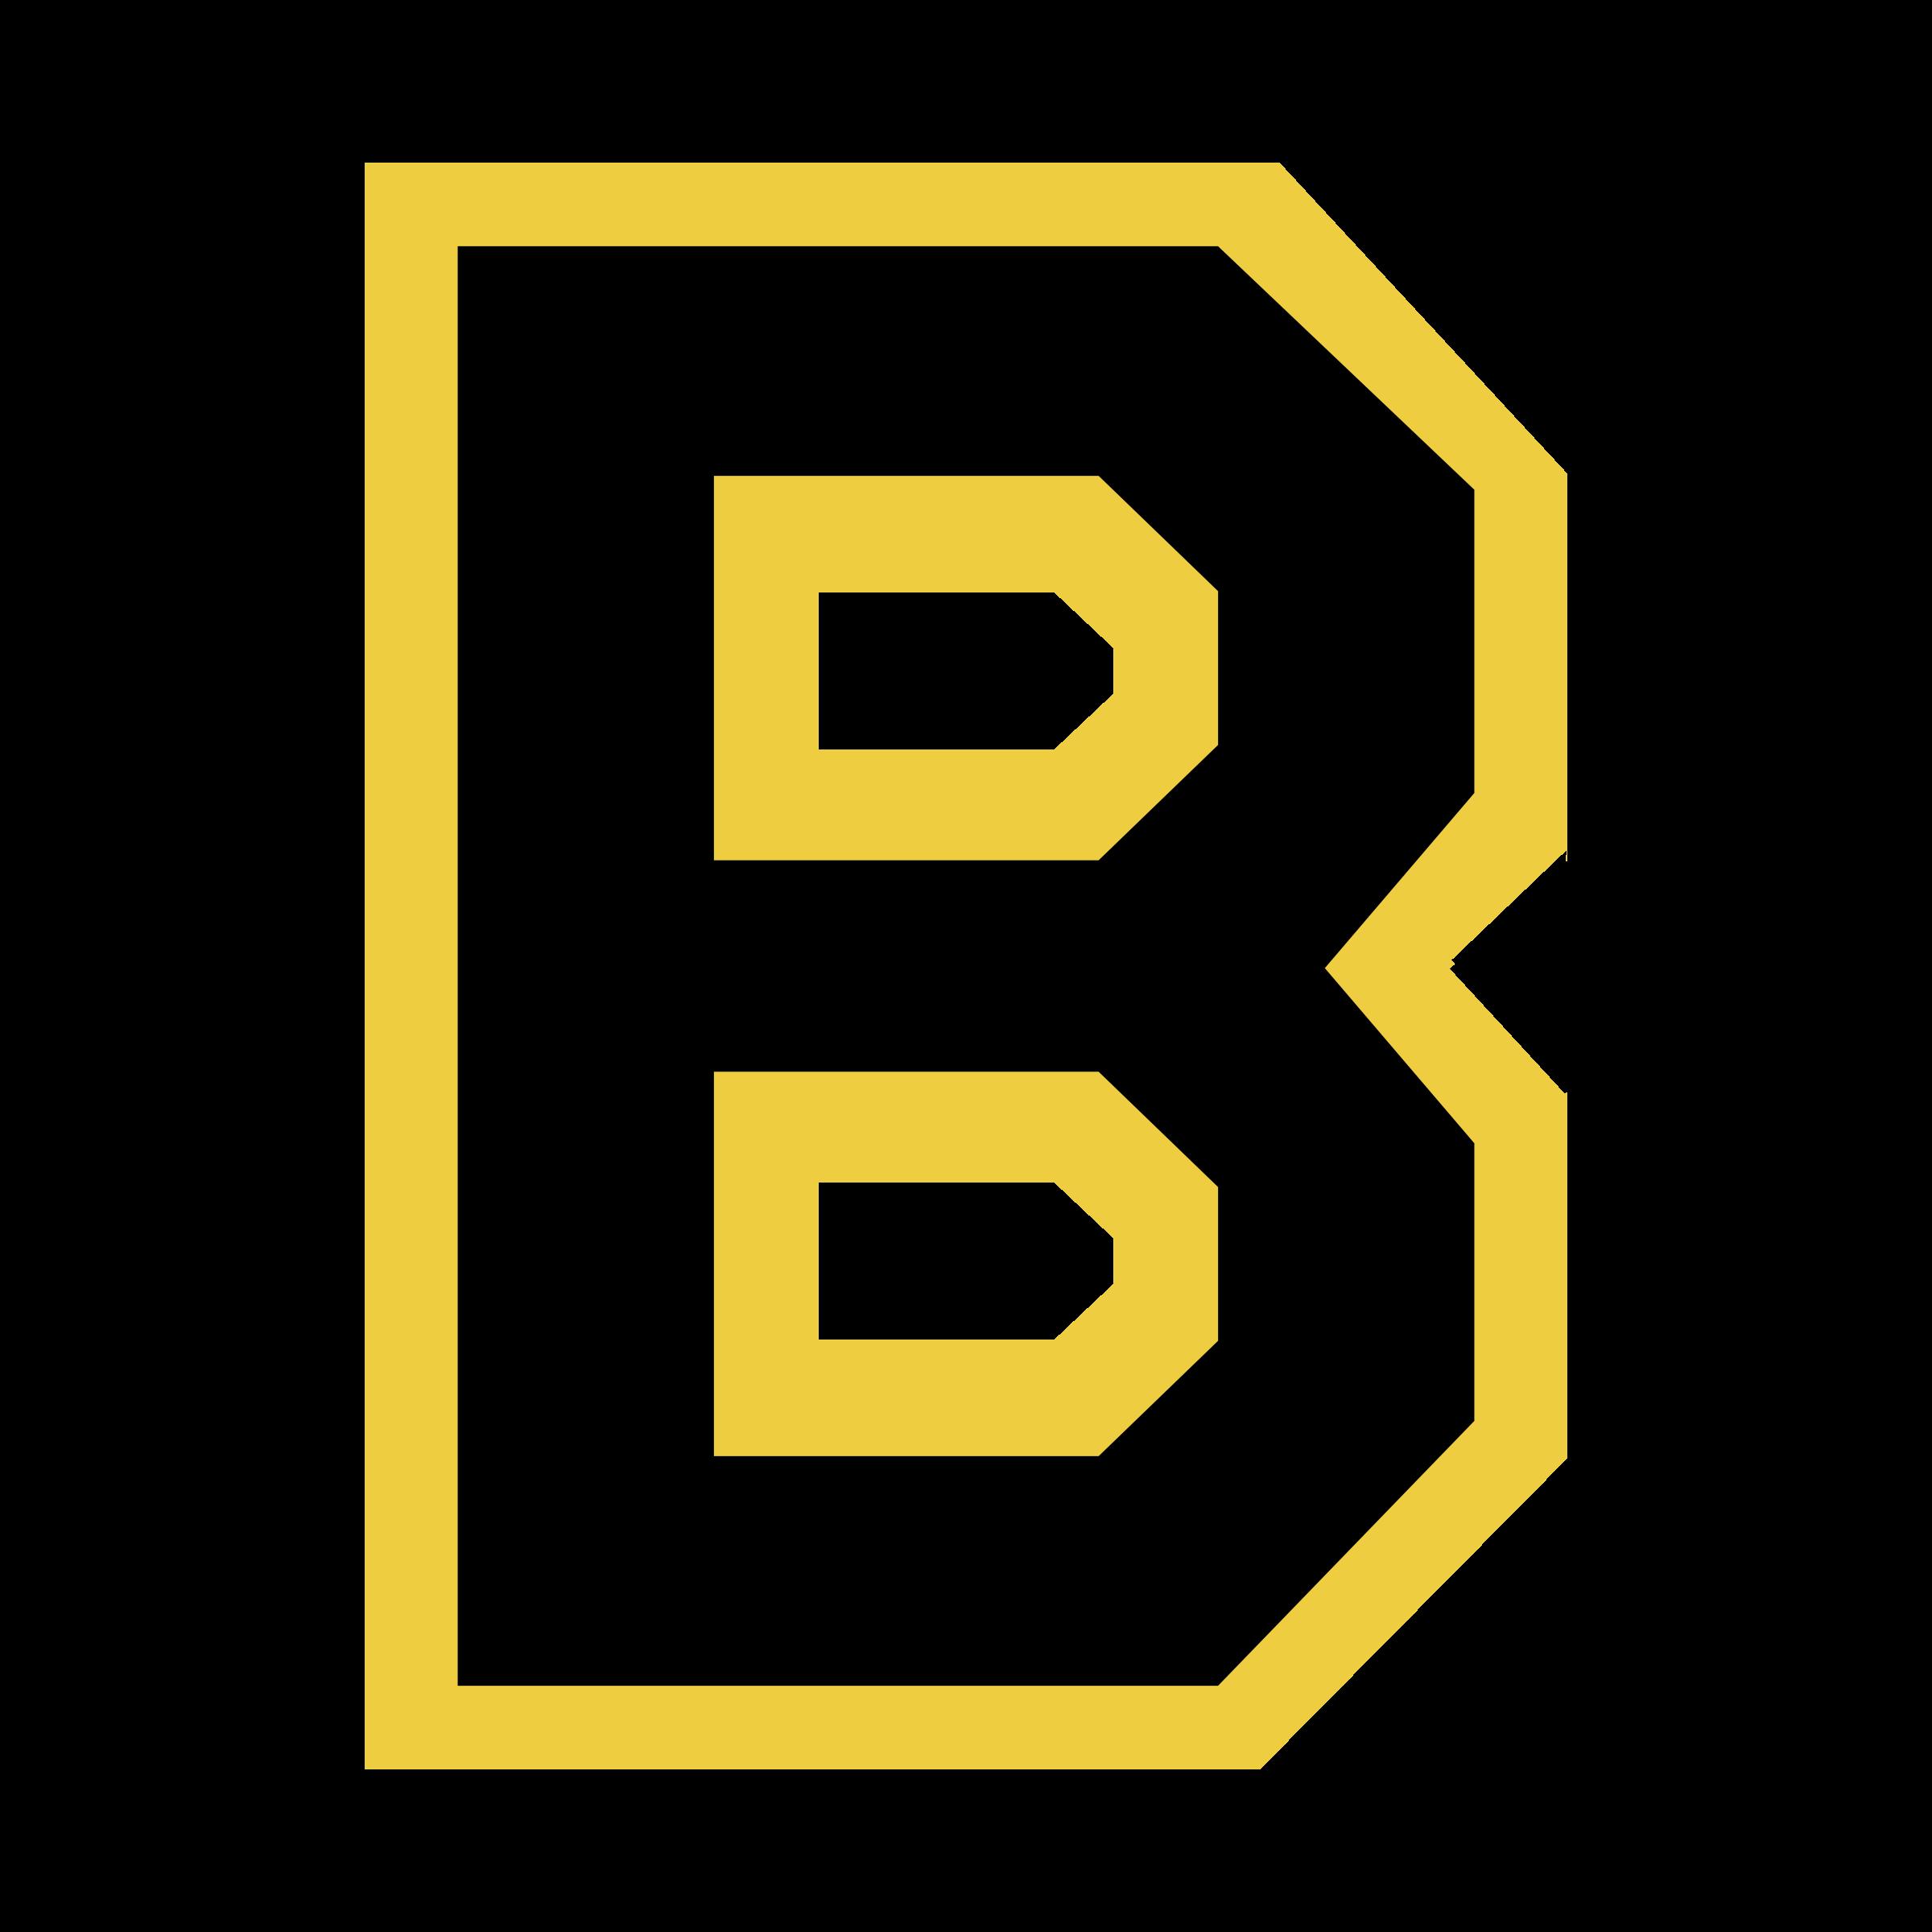 2400x2400 Boston Bruins Logo Png Transparent Amp Svg Vector